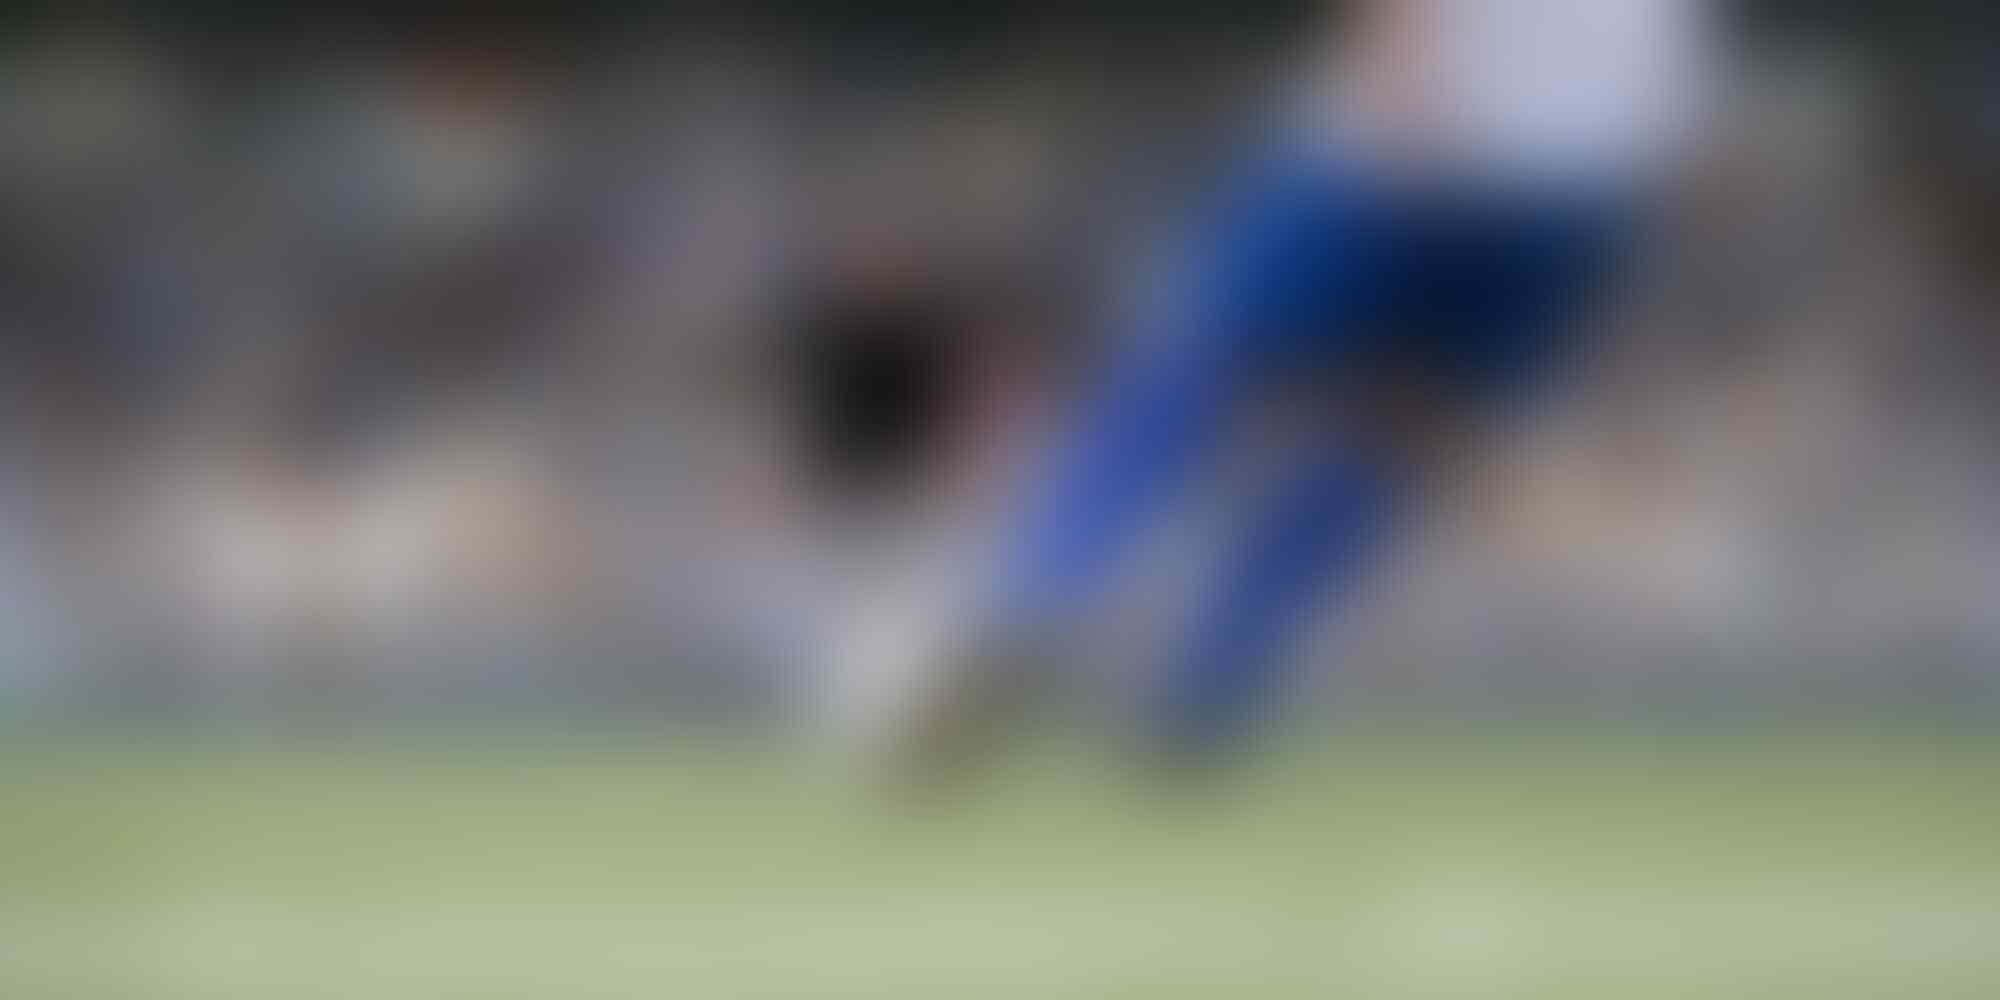 7 Kunci Tendangan Efektif di Sepak Bola Supaya Bisa Gol!